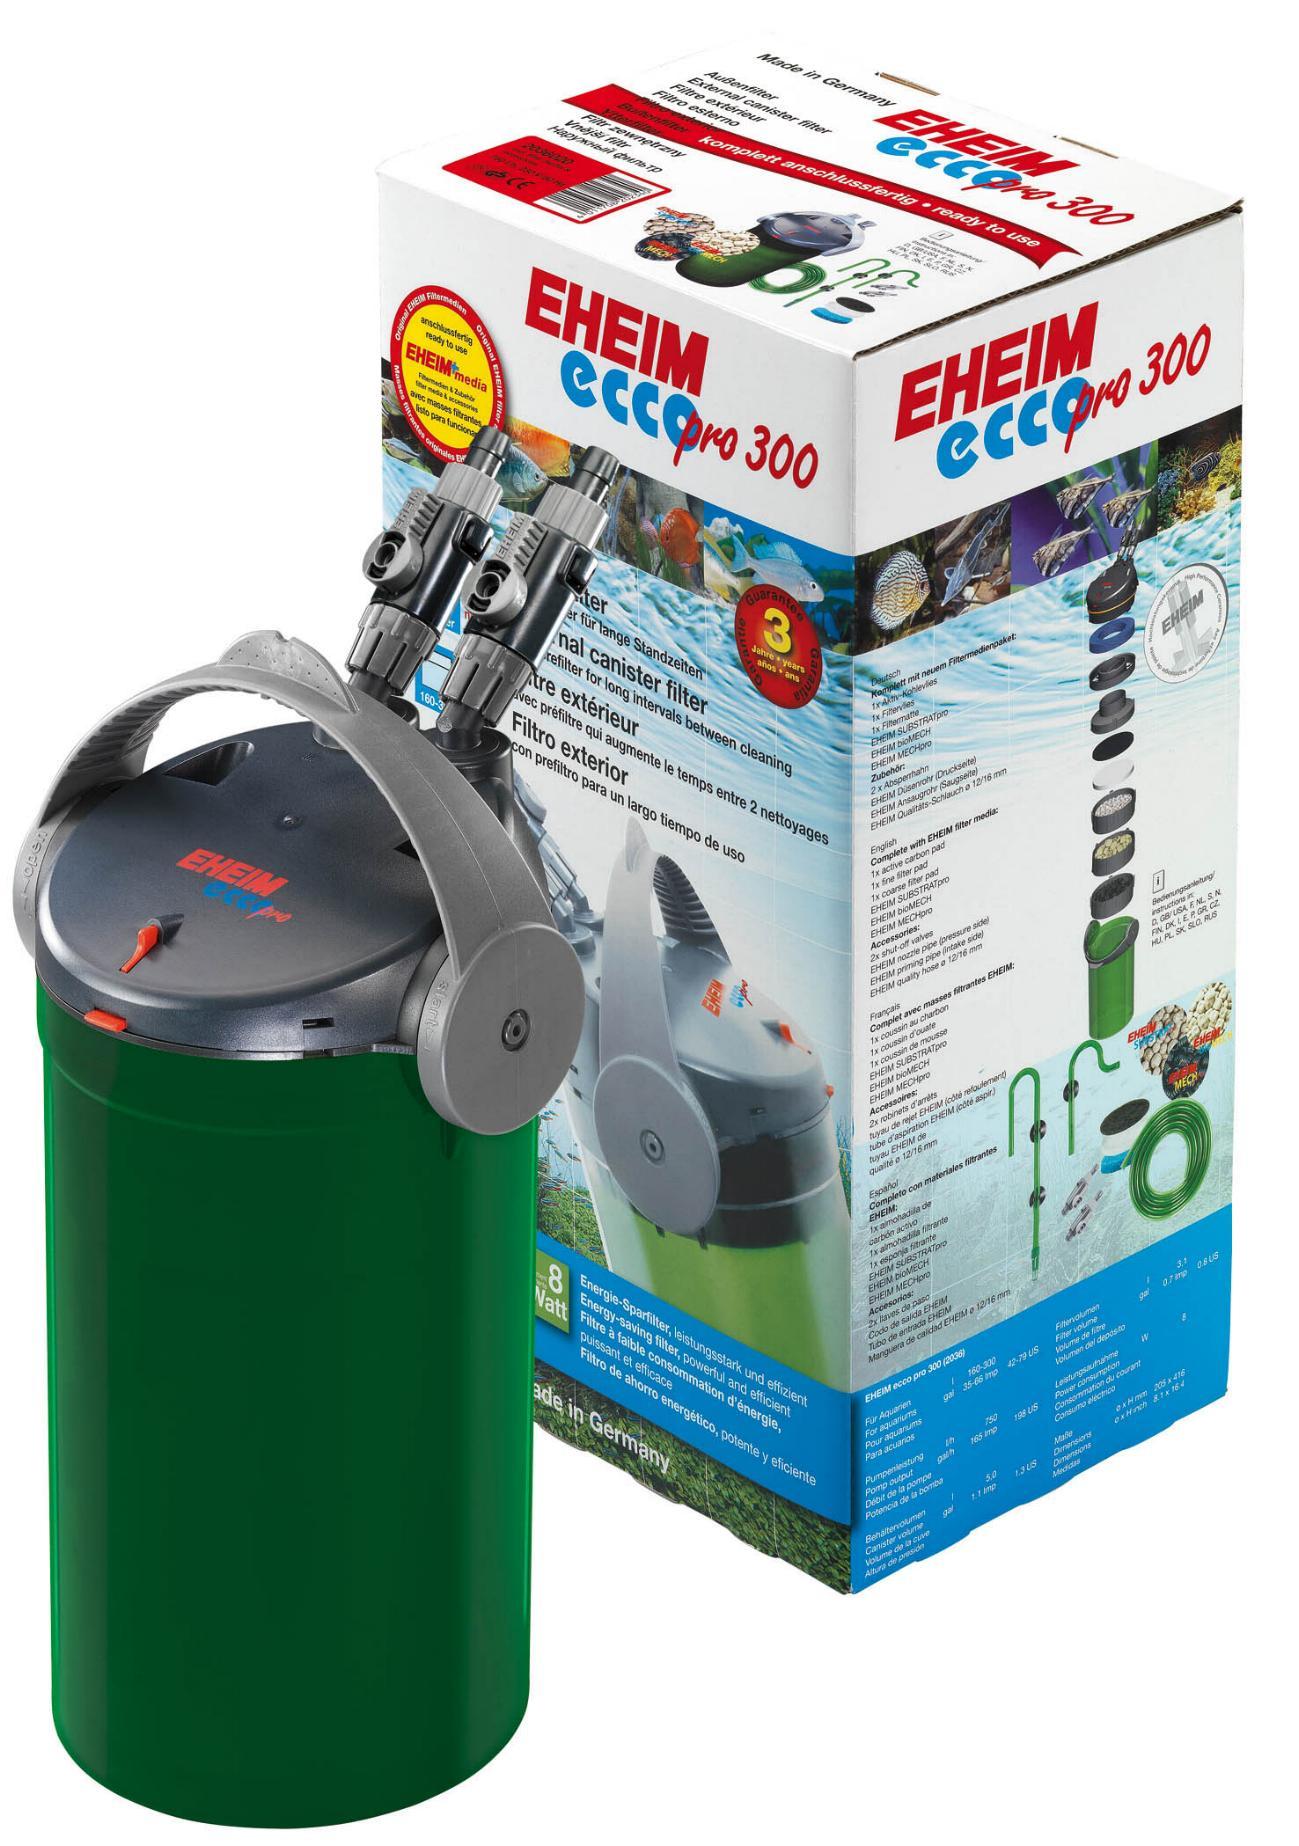 EHEIM GmbH Co. EHEIM ecco pro 300